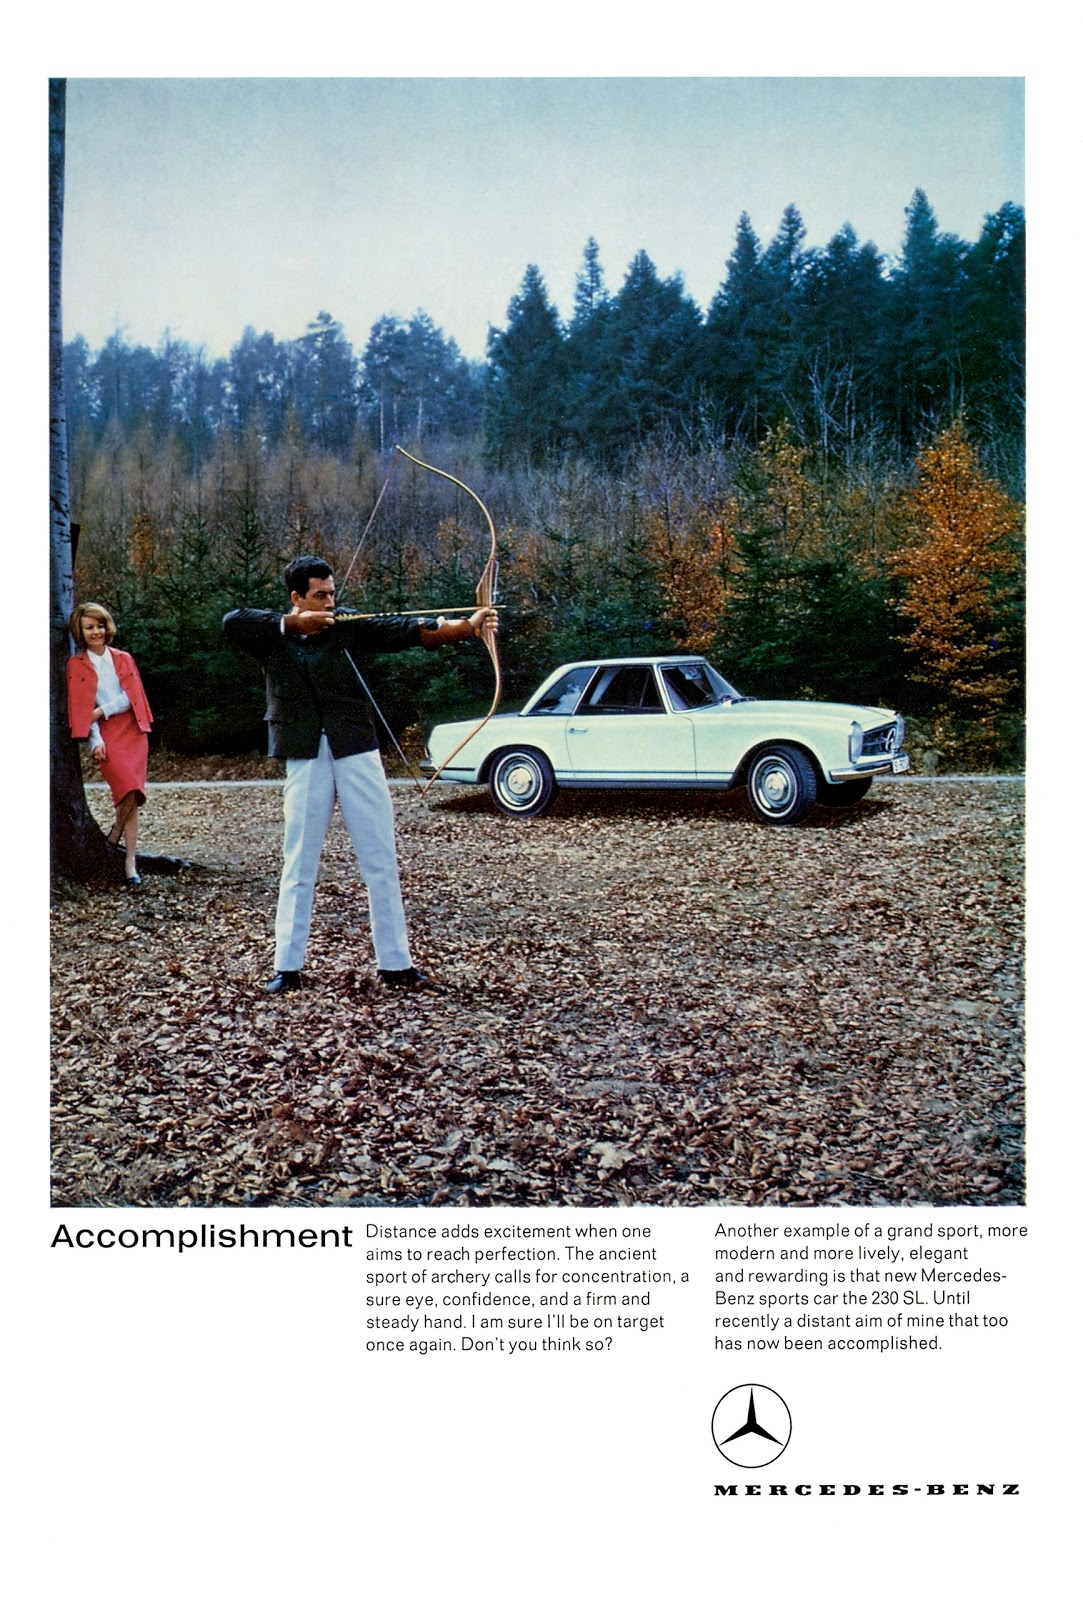 1964-Mercedes-Benz-230-SL-Accomplishment.jpg